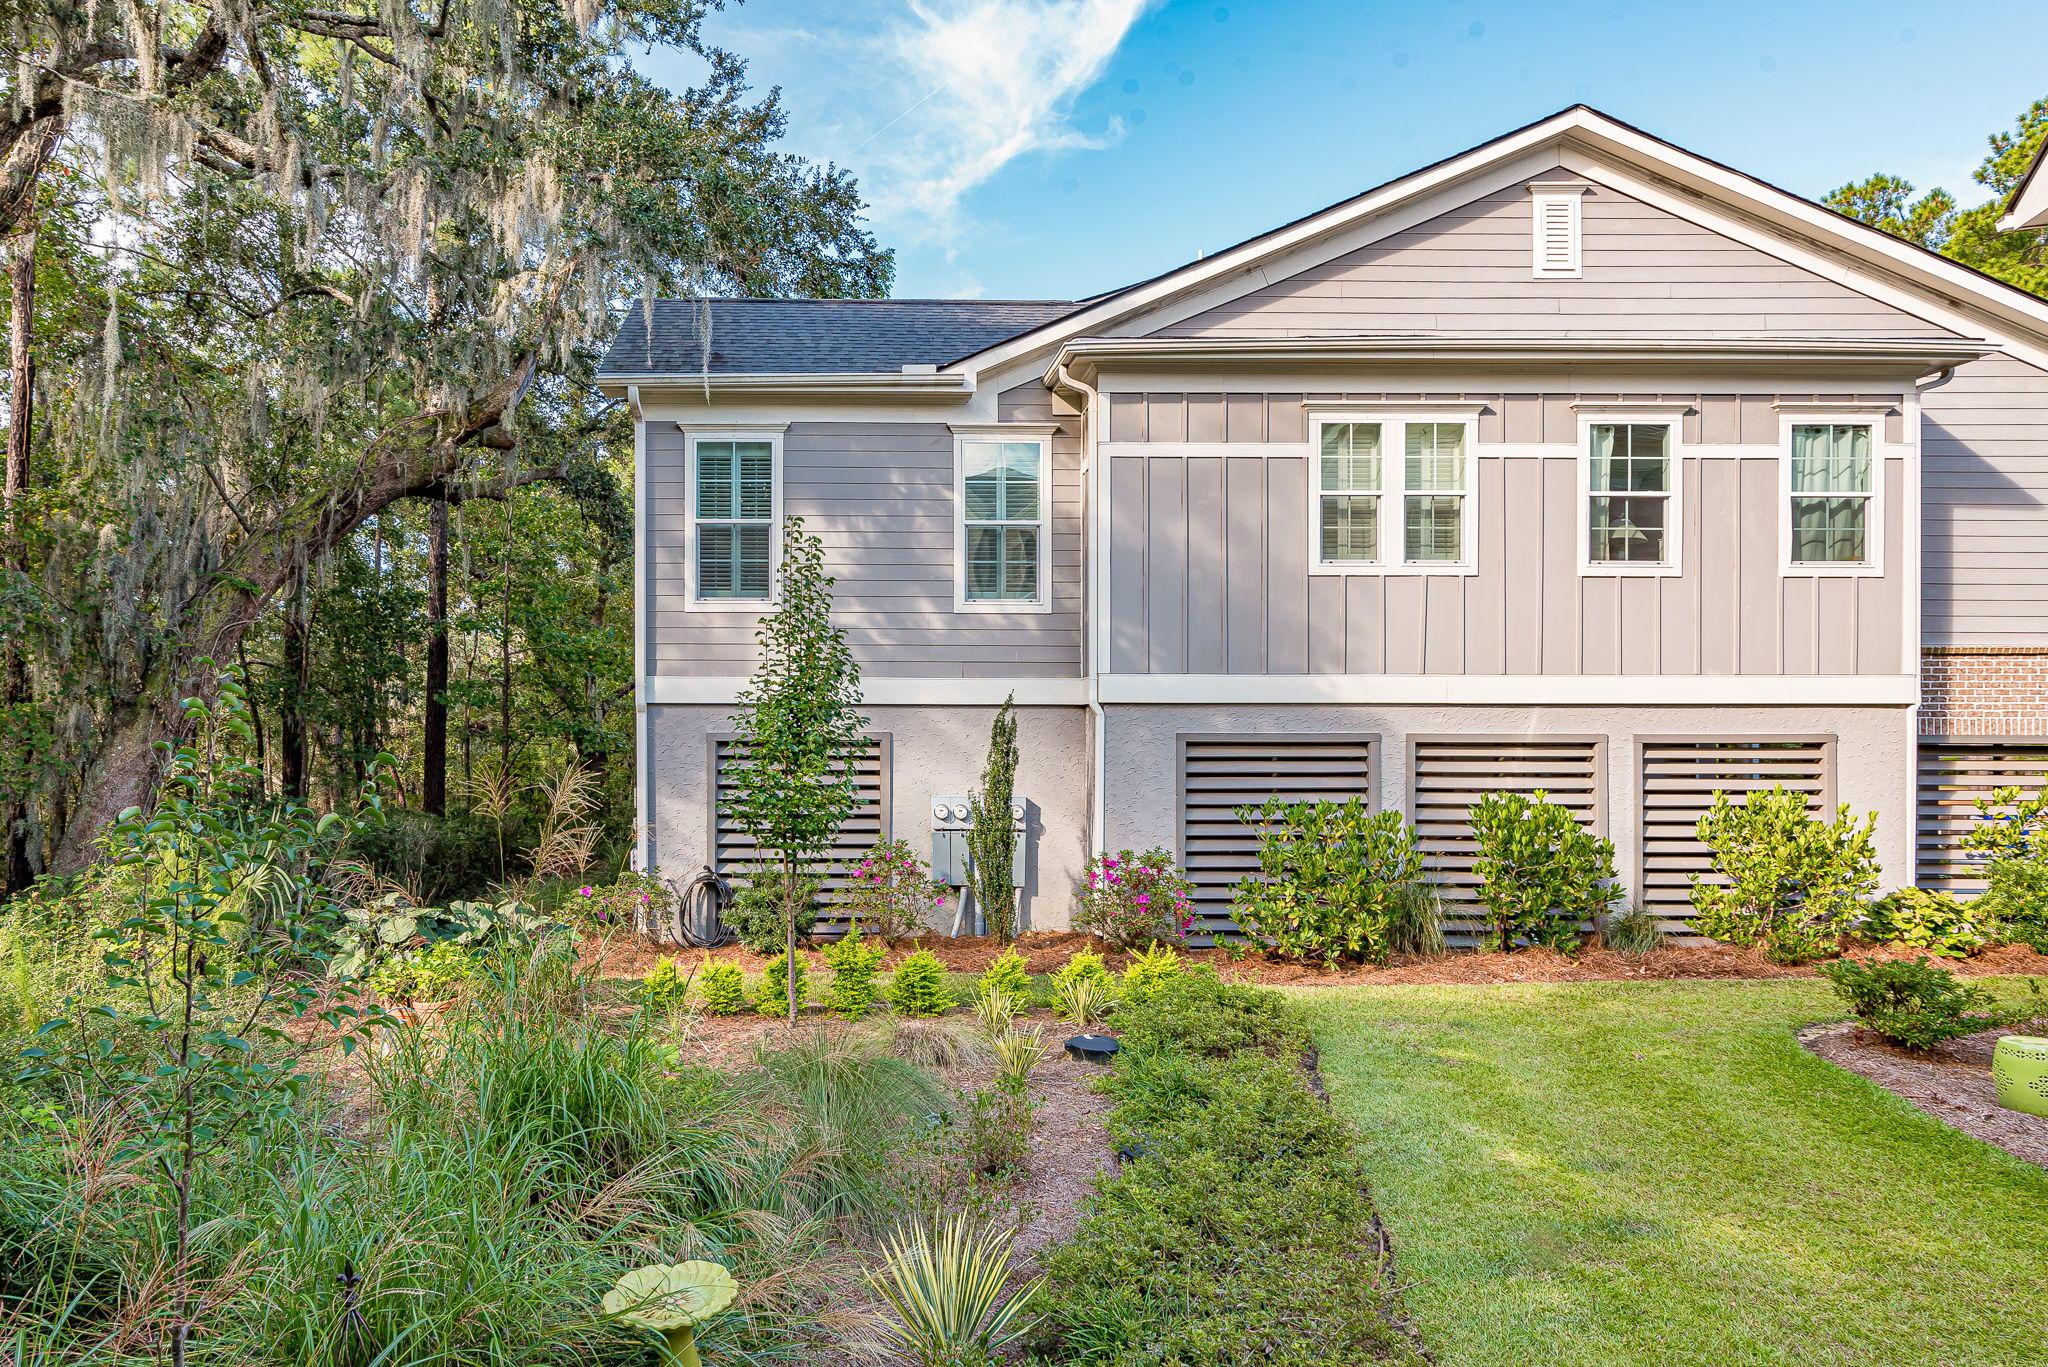 Etiwan Pointe Homes For Sale - 159 Slipper Shell, Mount Pleasant, SC - 19